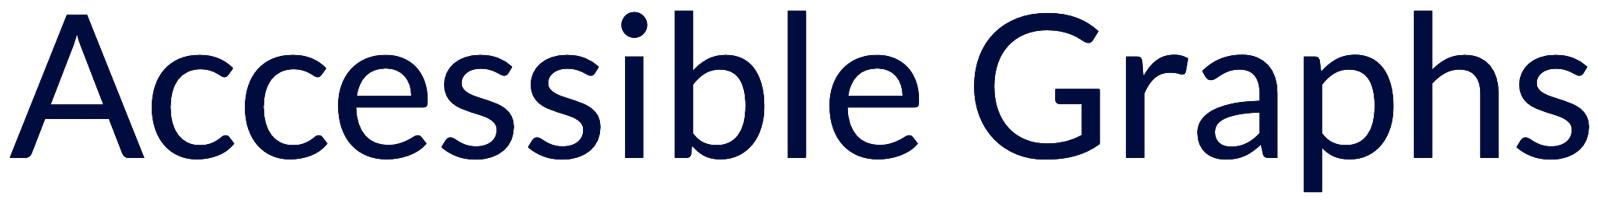 Accessible Graphs logo